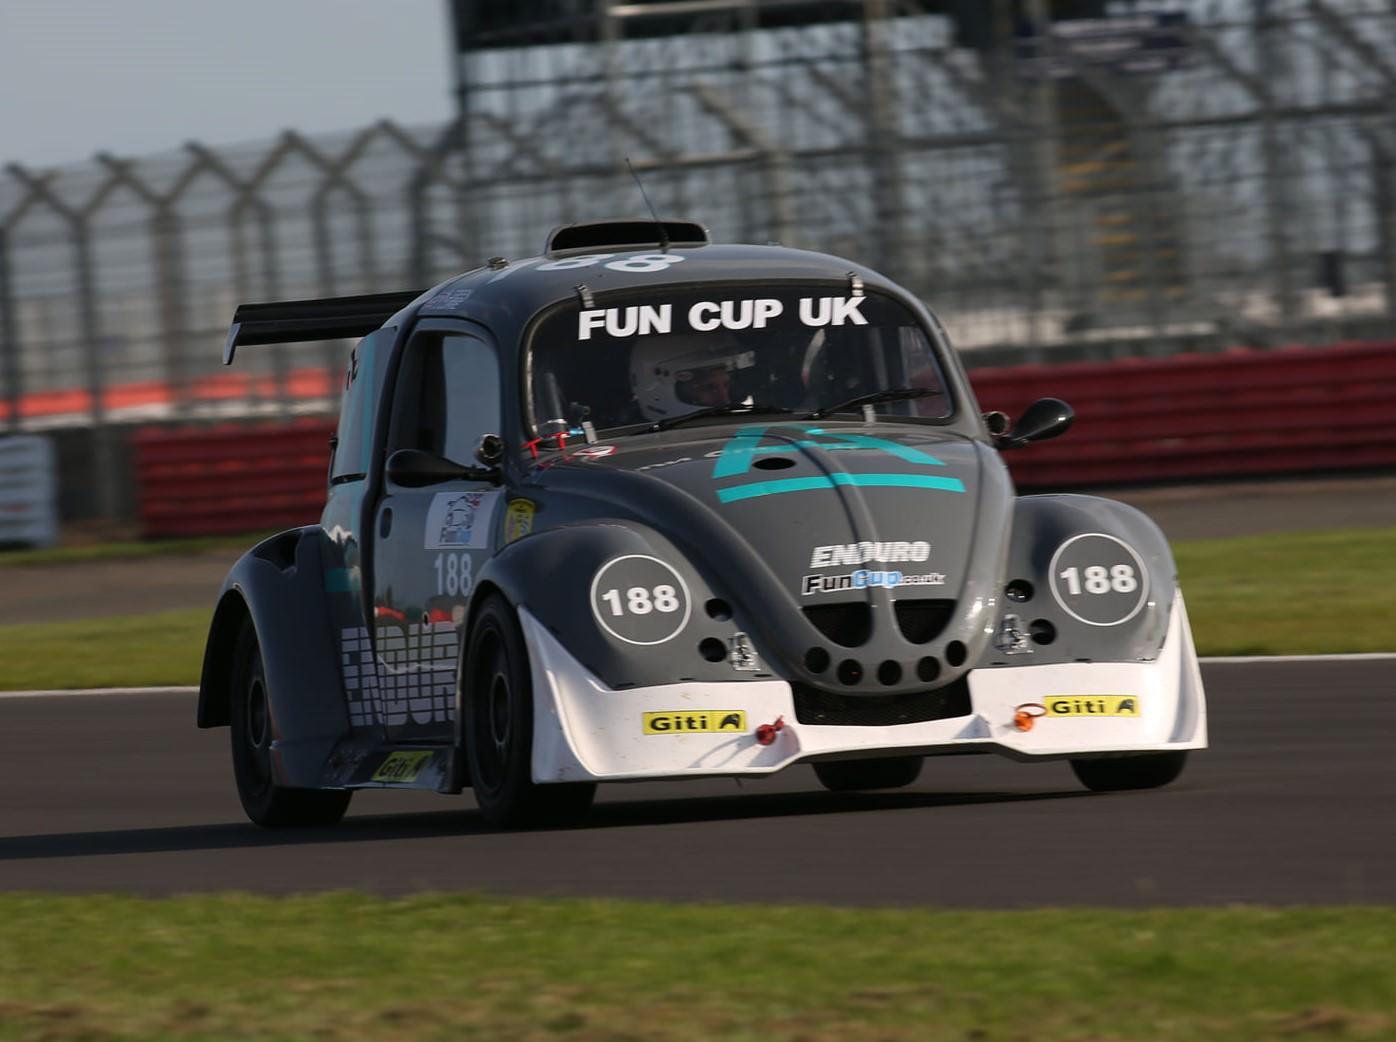 188 – Enduro Motorsport